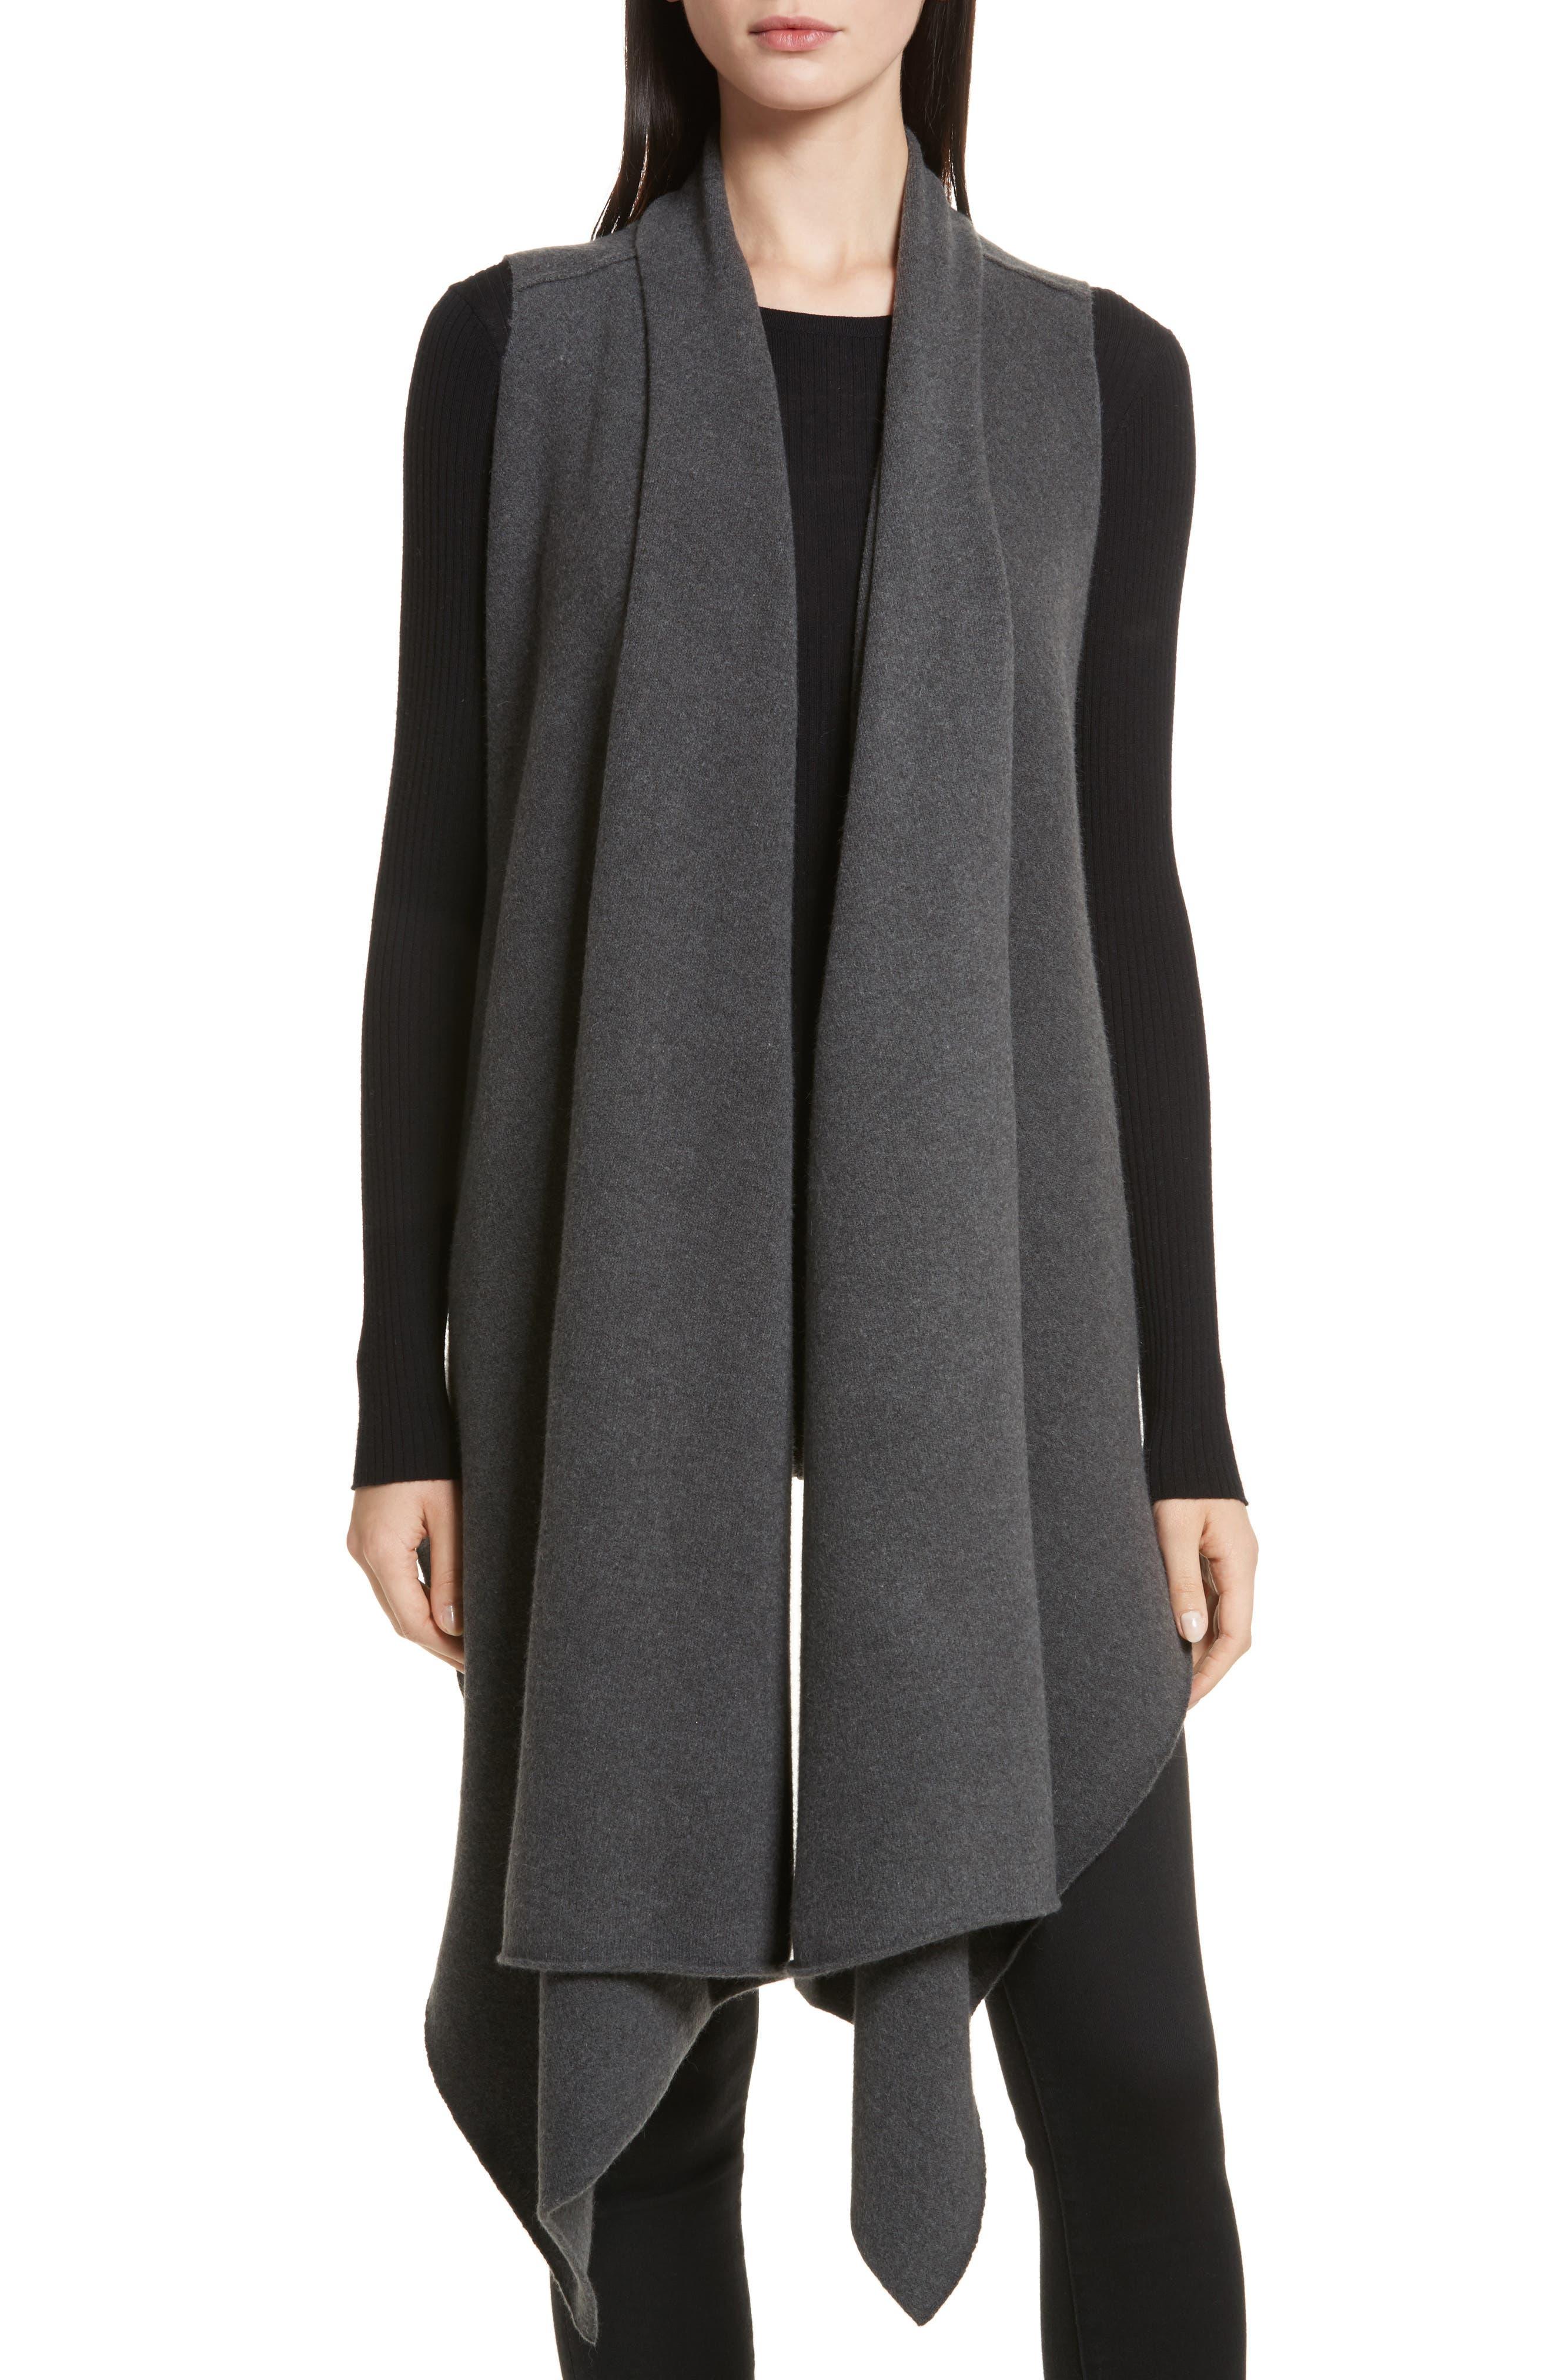 Sorin Merino Wool Blend Wrap Vest,                             Main thumbnail 1, color,                             020